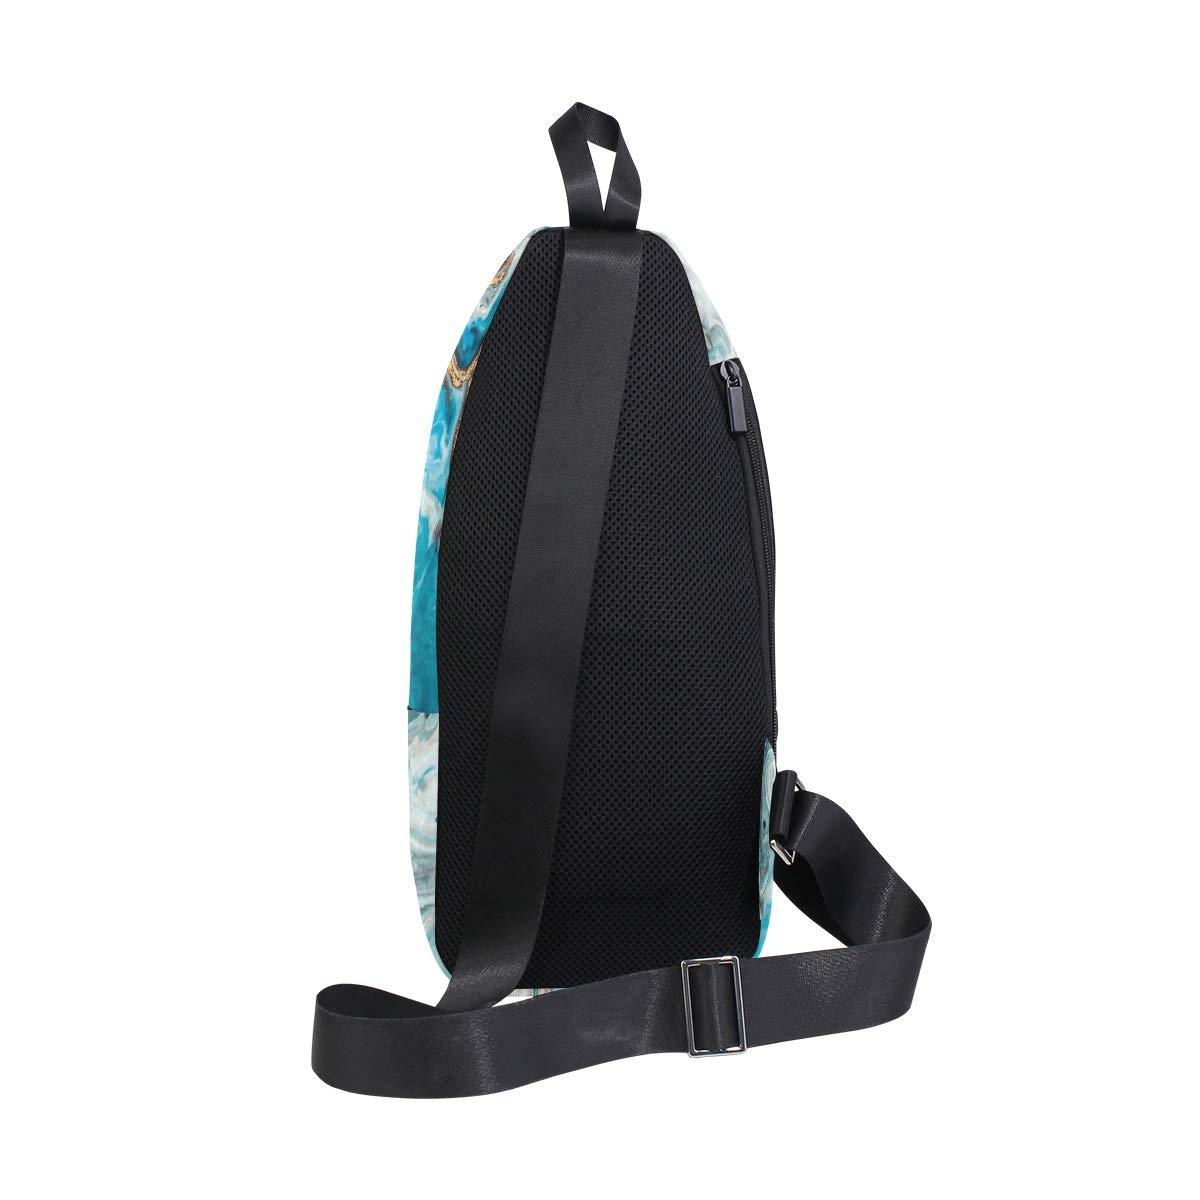 TFONE Abstract Marble Grain Crossbody Bag Lightweight Chest Shoulder Messenger Pack Backpack Sling Bag